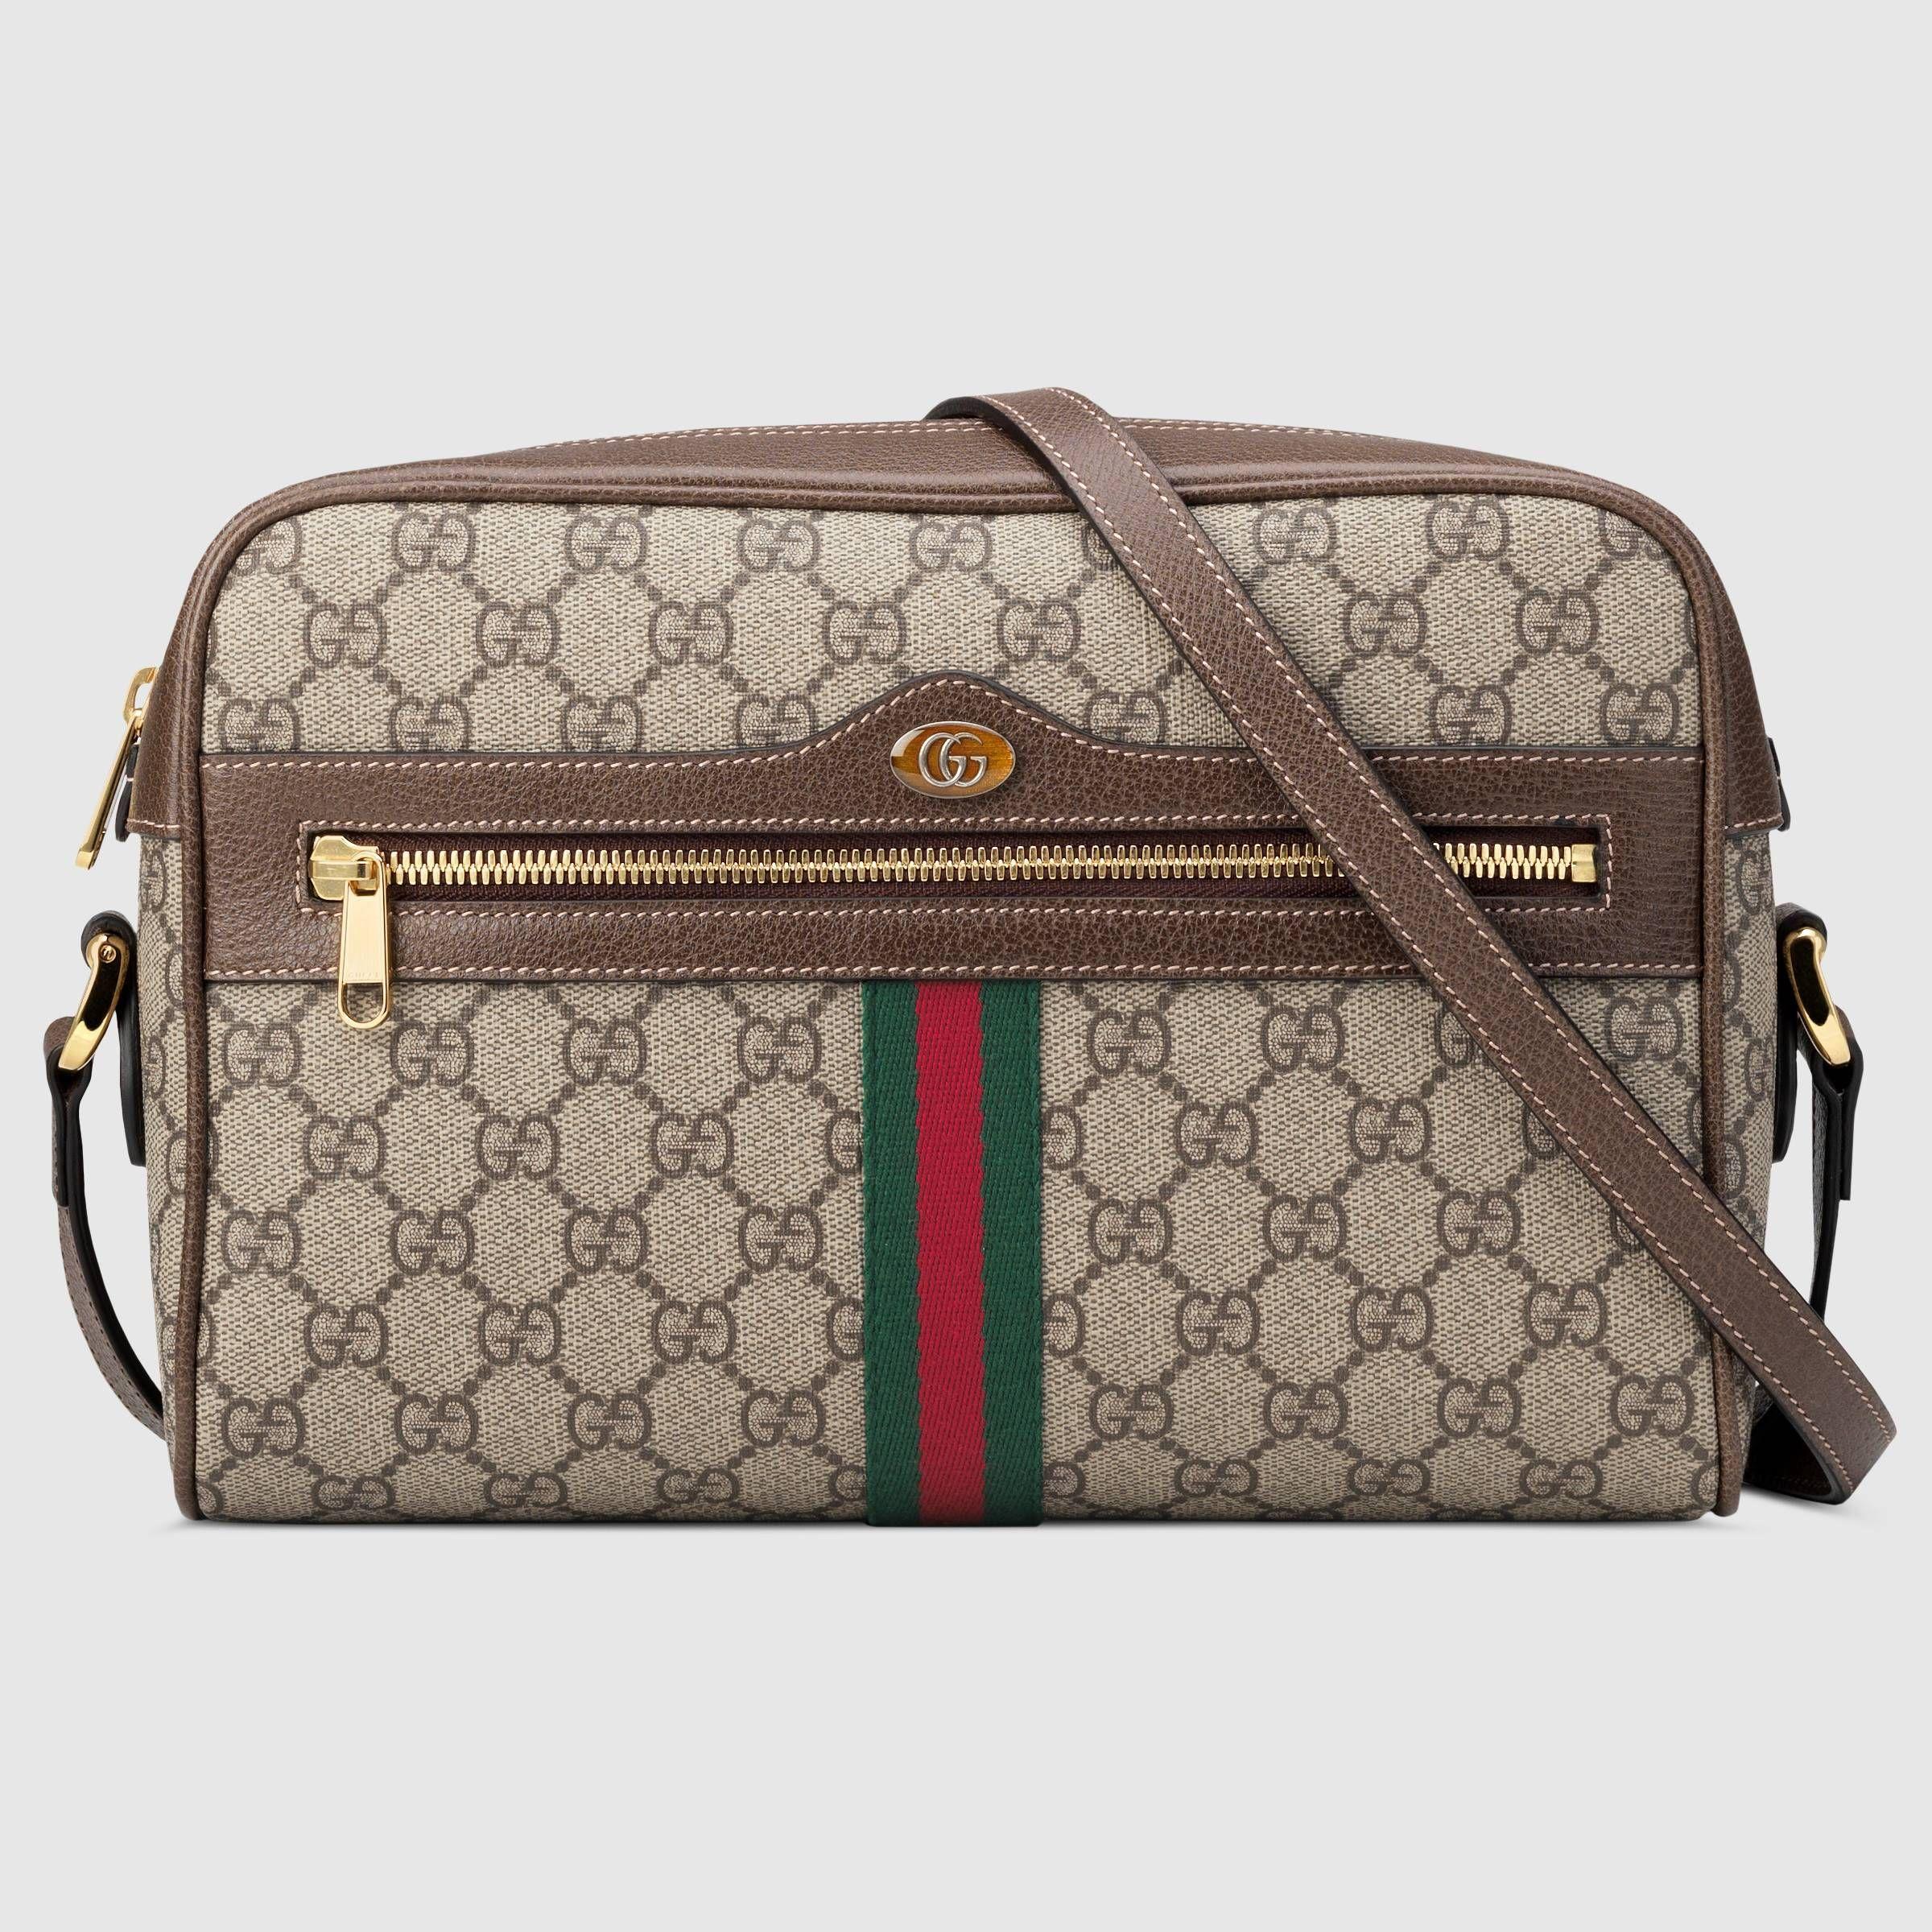 c2b1426bbe1 Ophidia GG Supreme small shoulder bag - Gucci Women s Shoulder Bags  51708096I3B8745 Gucci Shoulder Bag